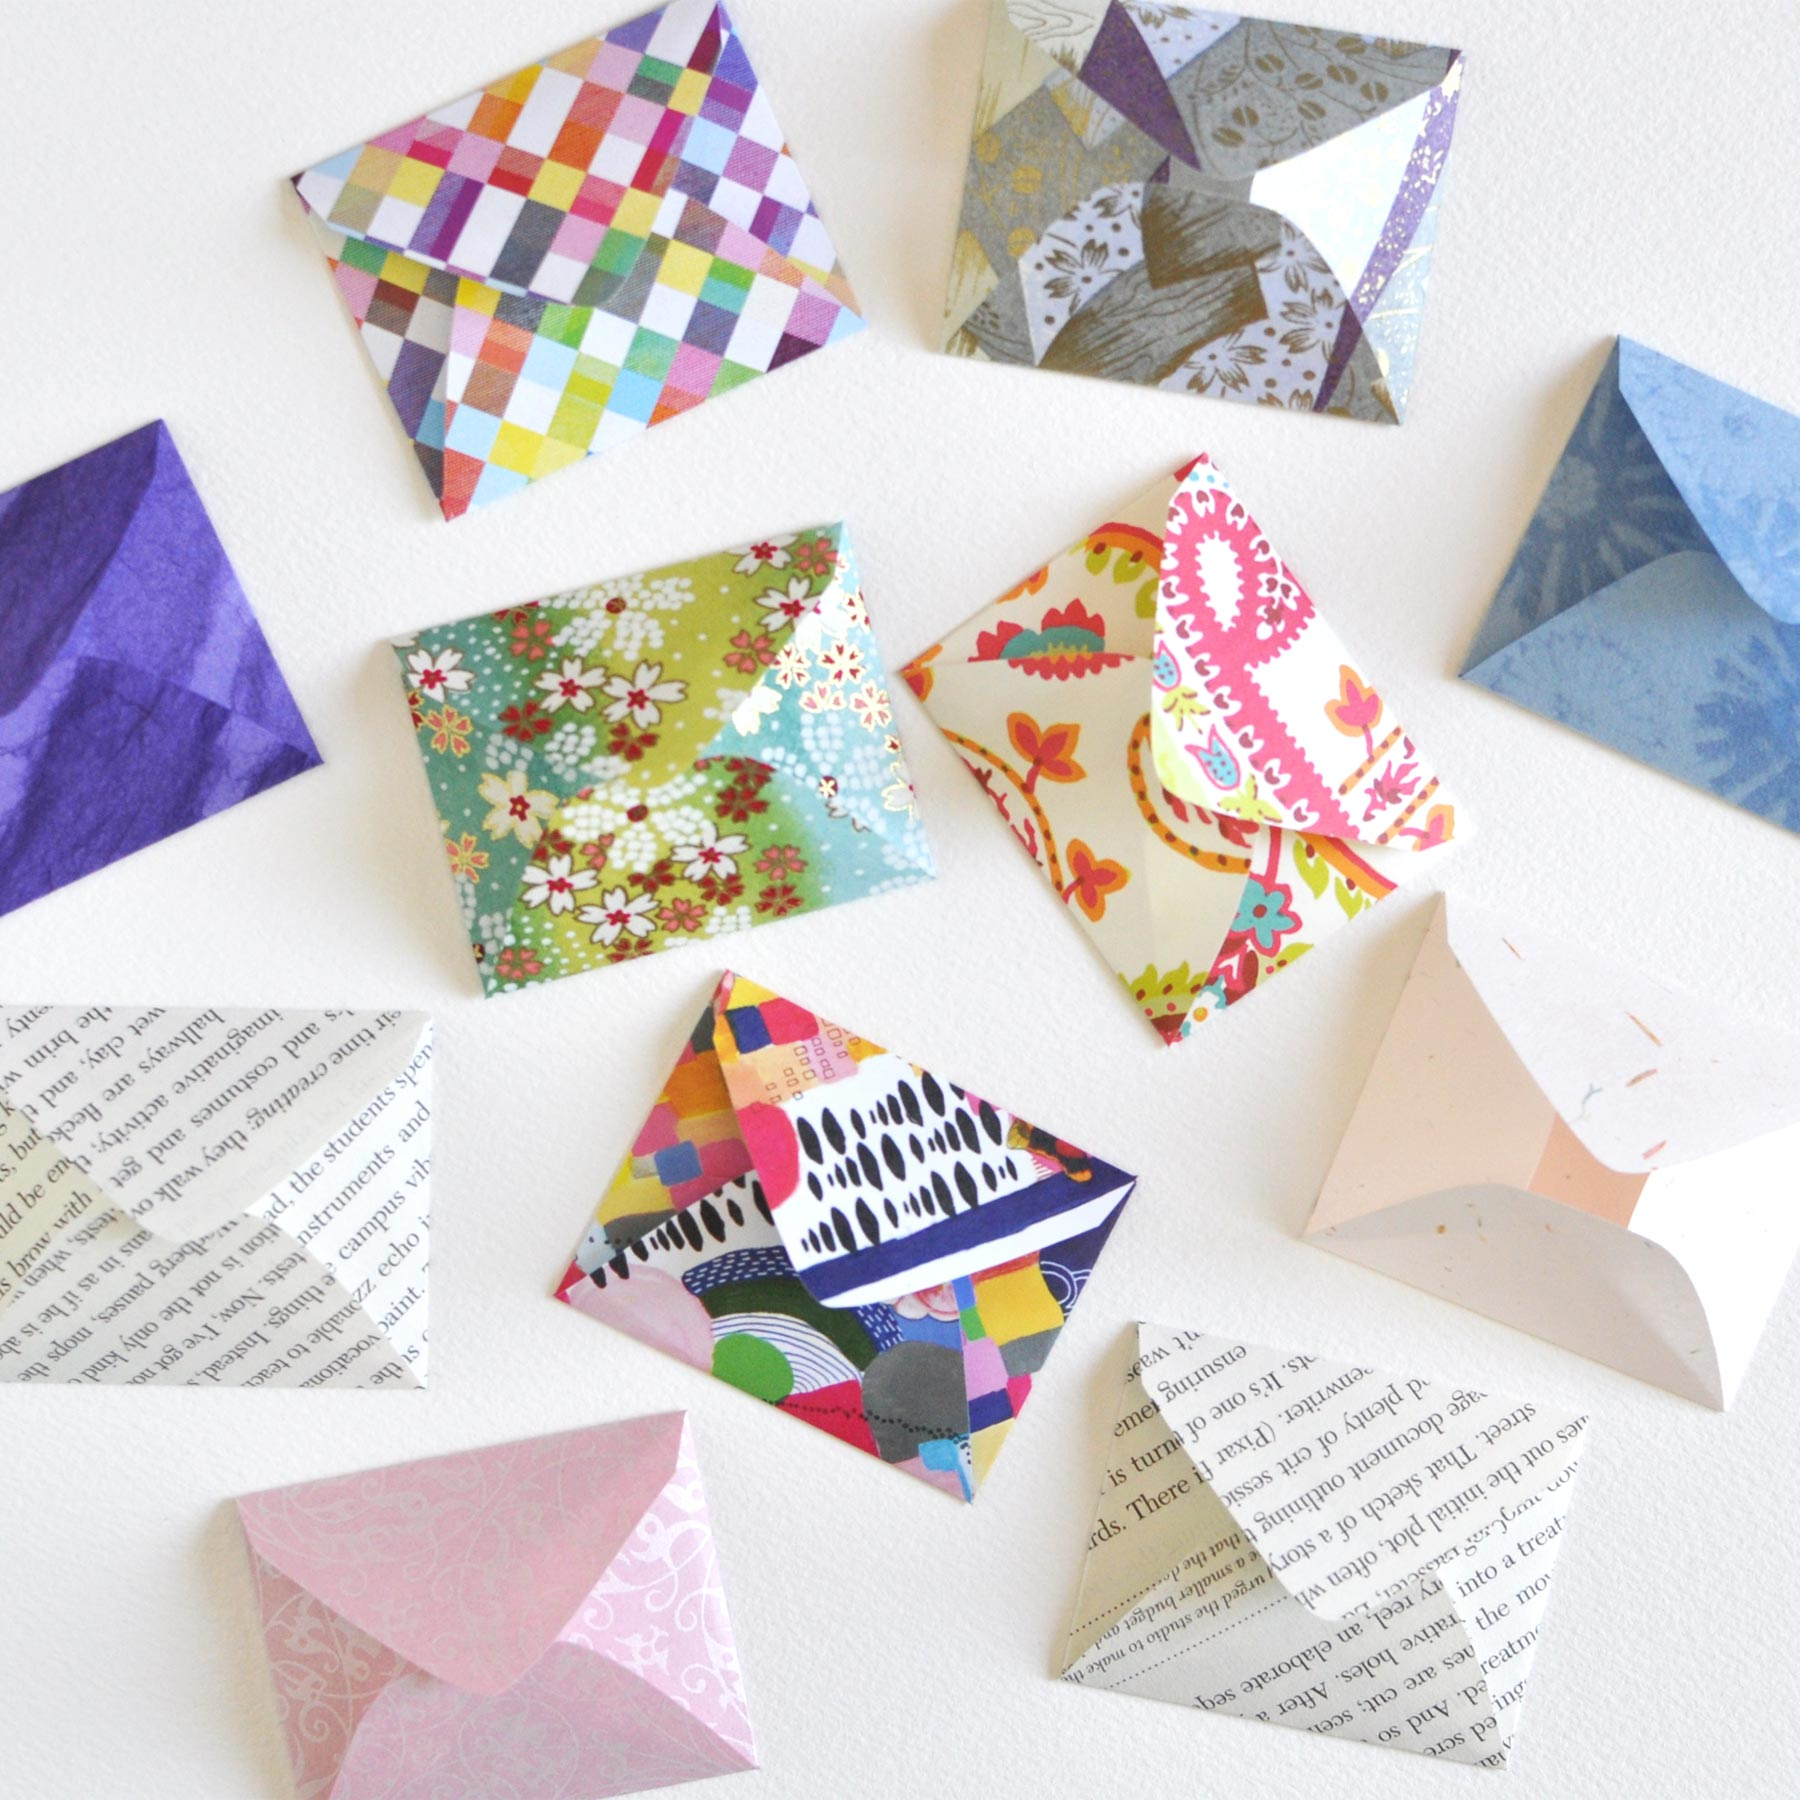 Envelope-Journal-Image-3.jpg